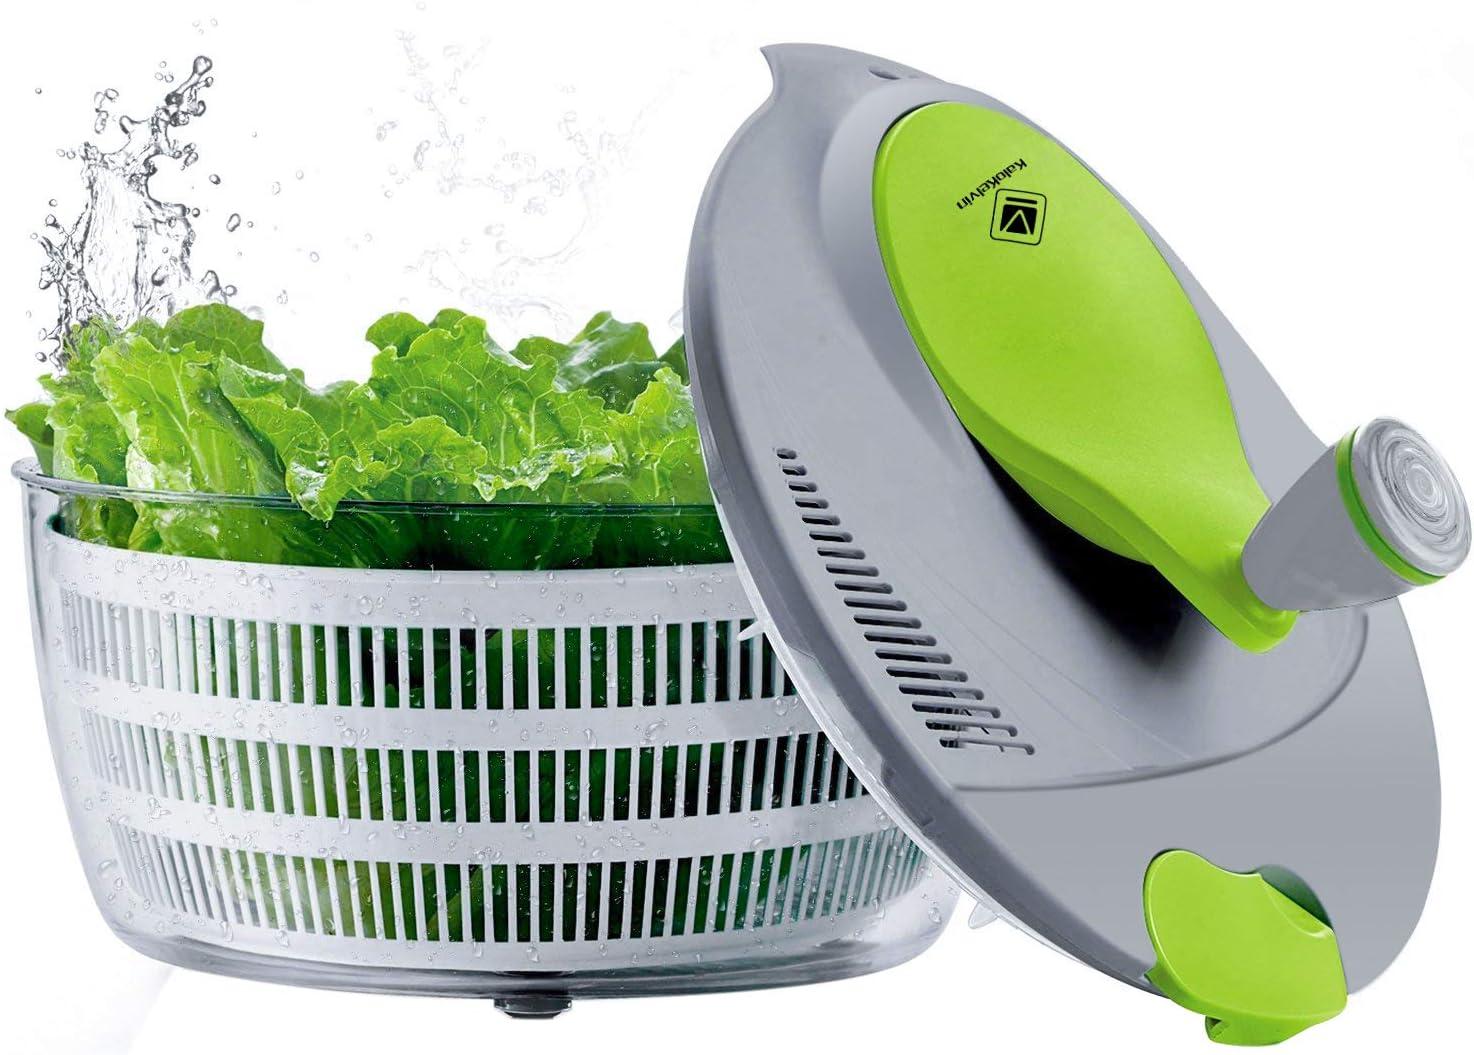 kalokelvin Super intense SALE Salad Spinner 4 Quarts Quick Vegetables Dryer New mail order Fre BPA